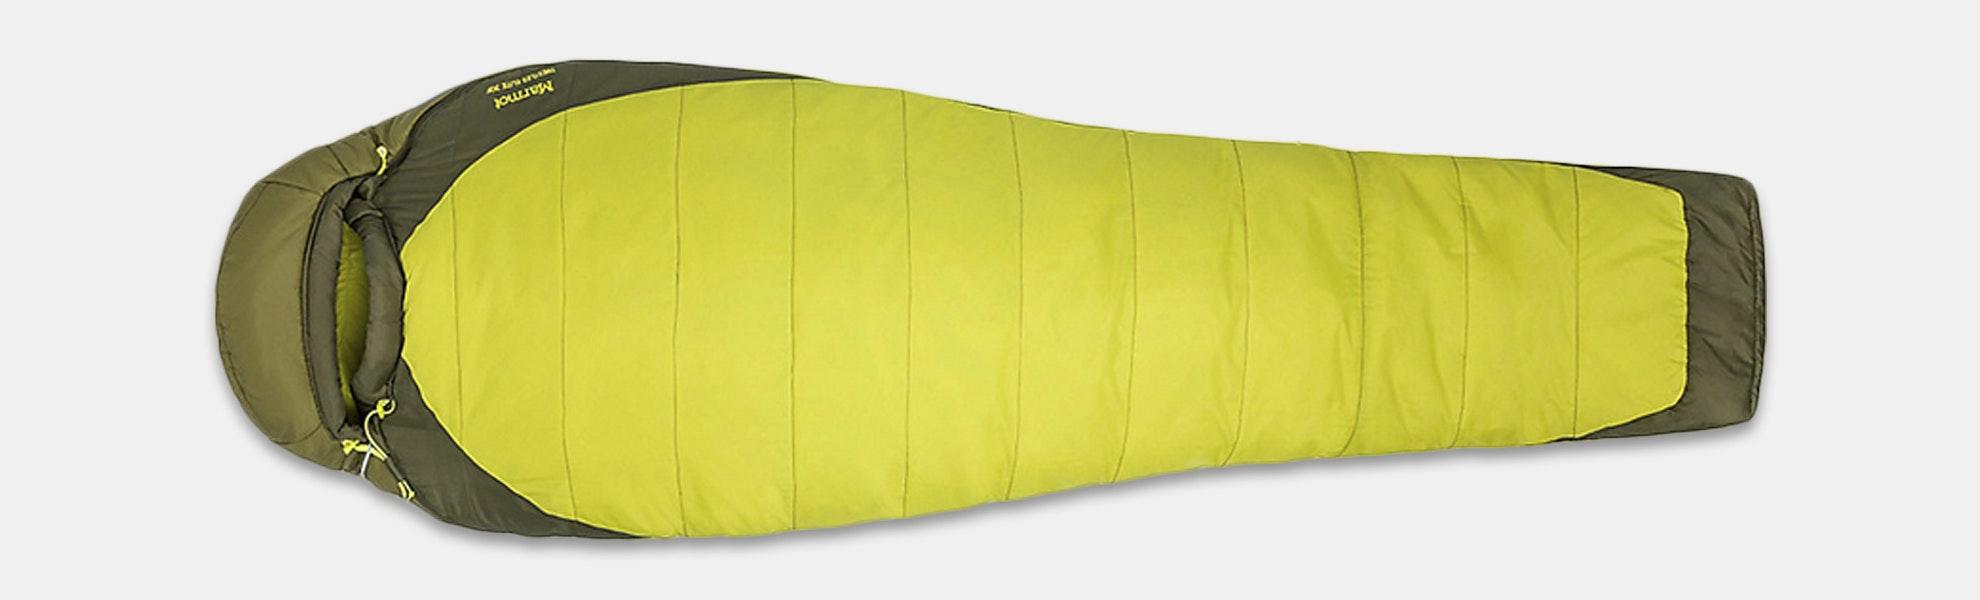 Marmot Trestles Elite 30 Sleeping Bags